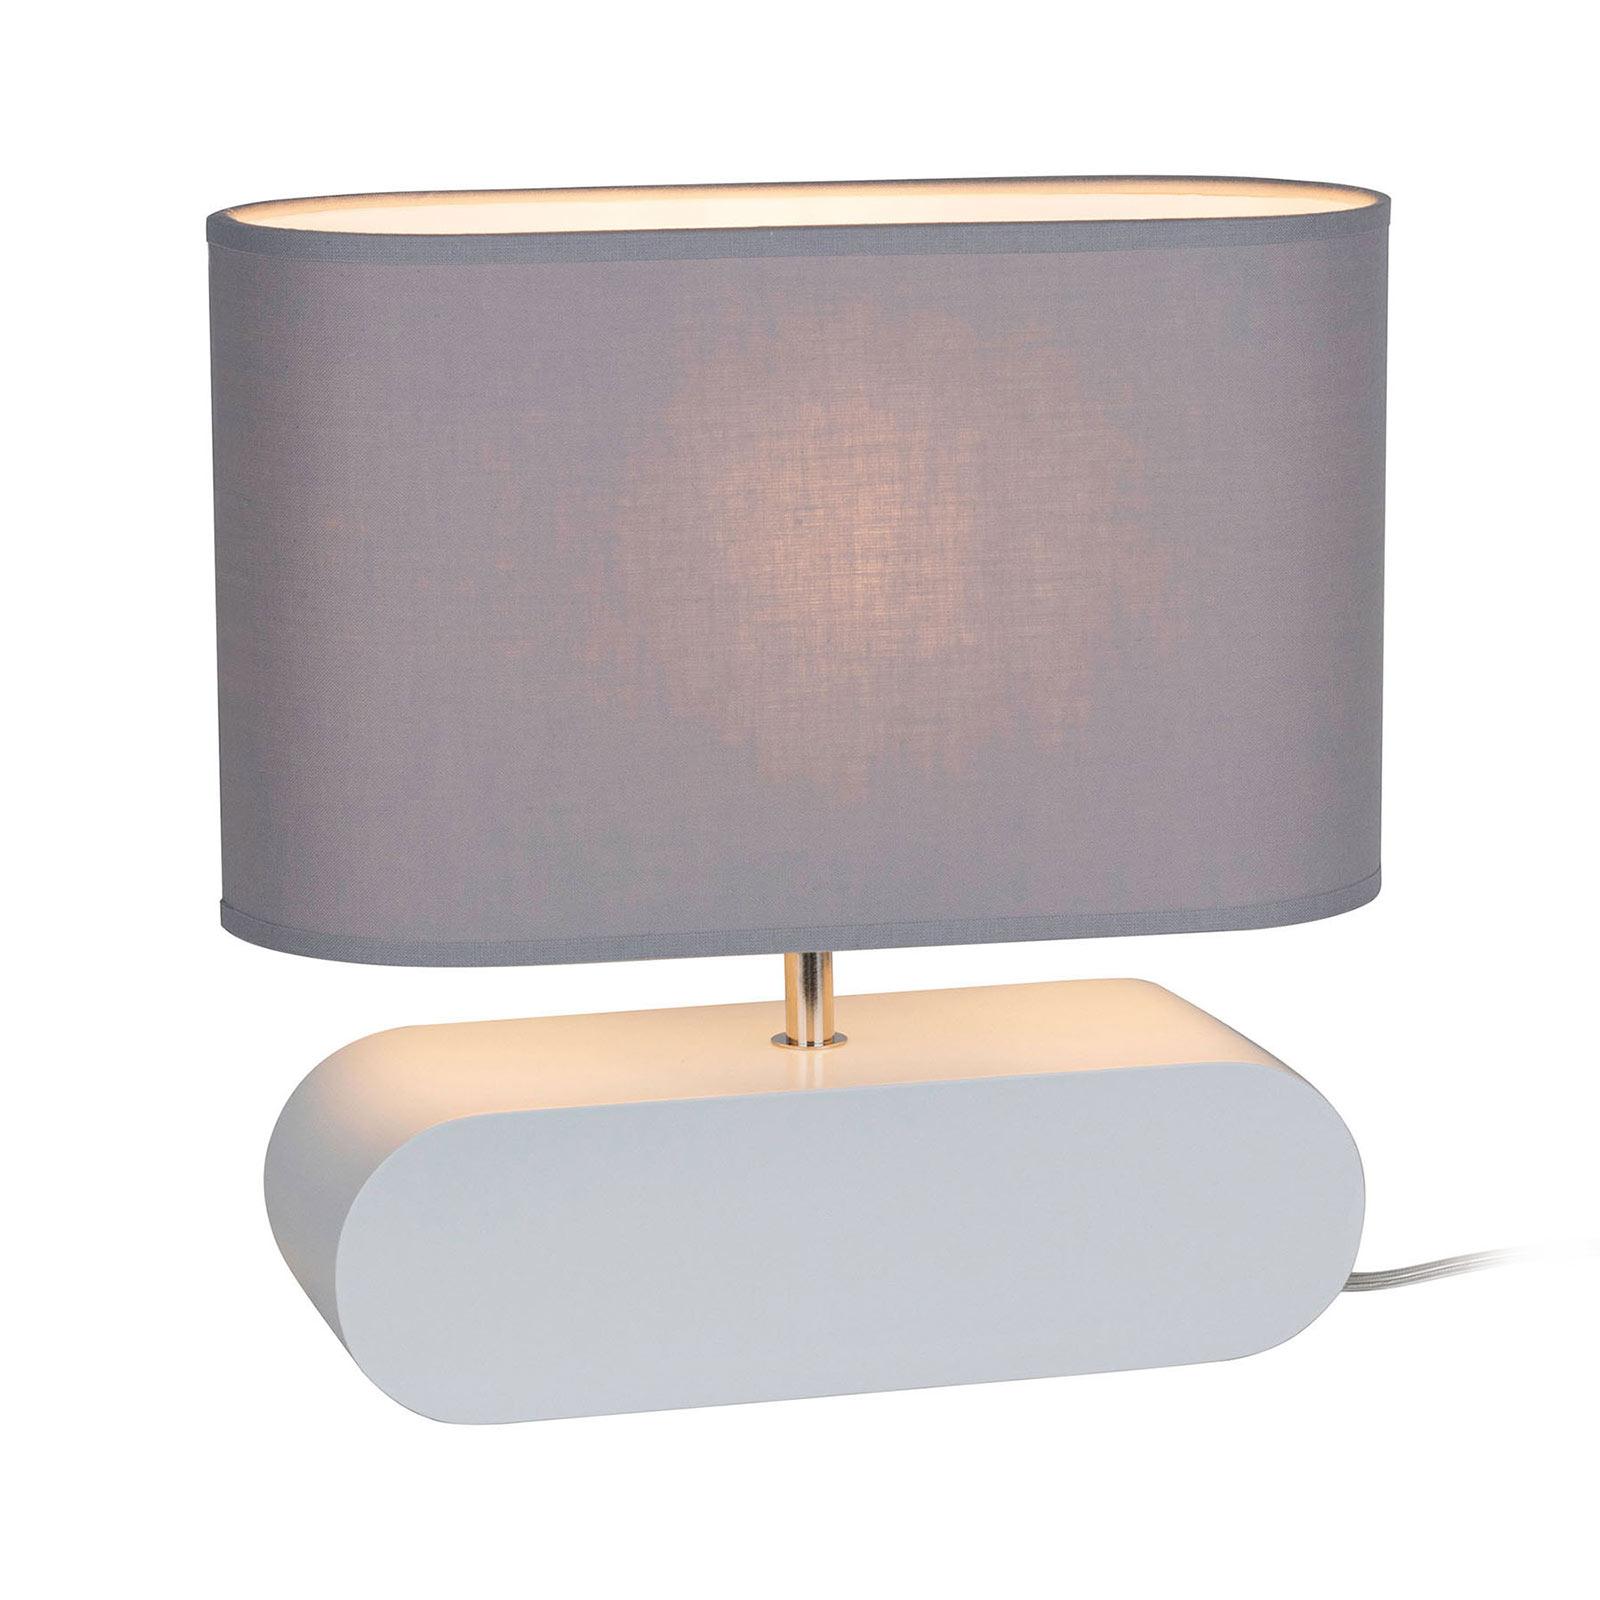 Lampe table Cassy pied blanc, abat-jour tissu gris